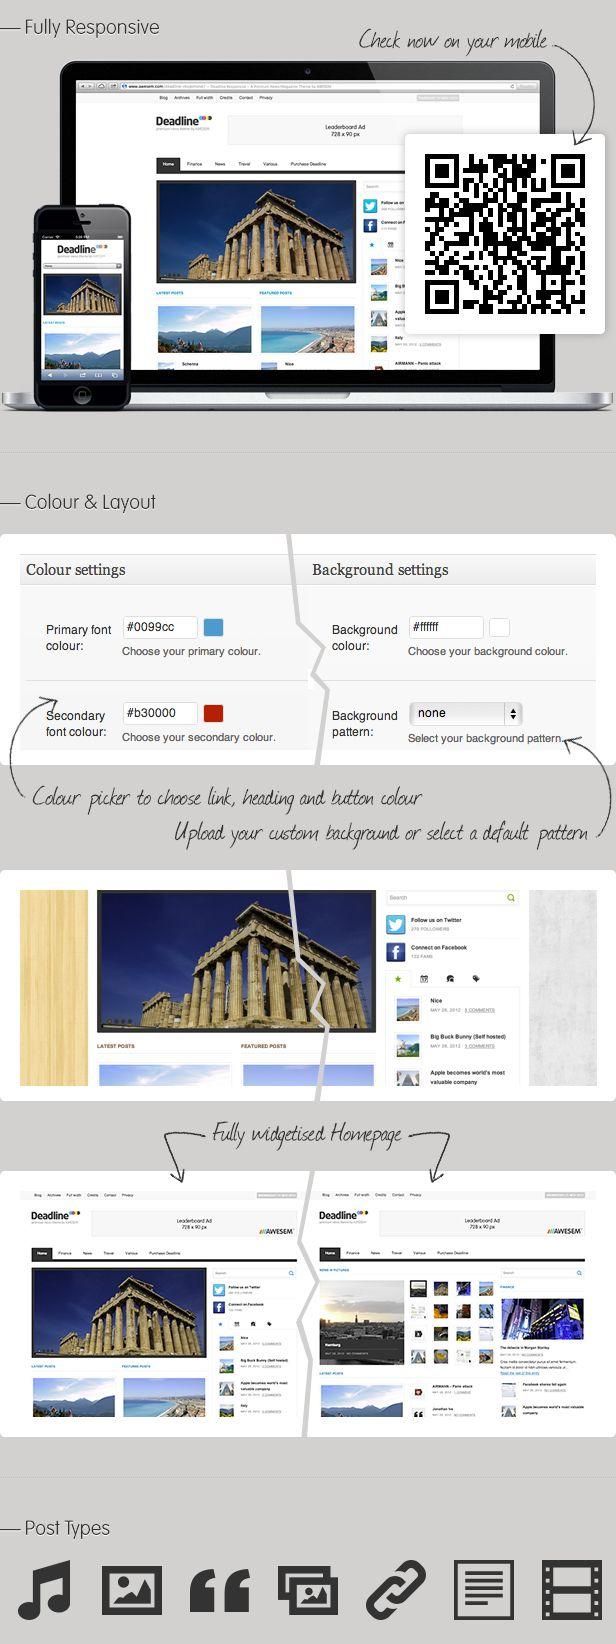 Color picker online upload image - Deadline Responsive Wordpress News Magazine Theme